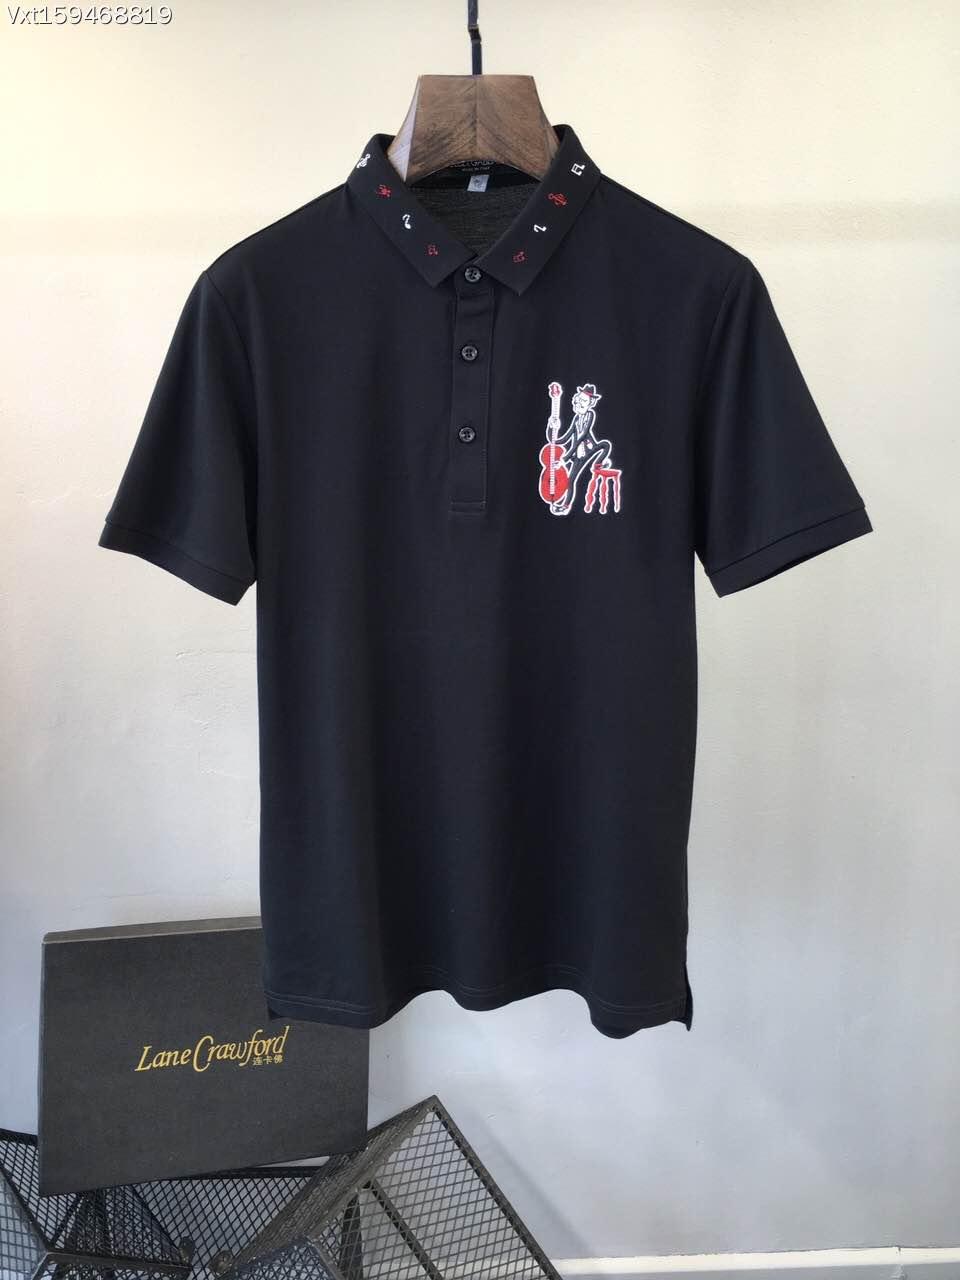 2015 new real camisa solid polo shirt mens fashion cool design short - Bh B6825 Fashion Men S Tops Tees 2017 Summer Hot Sale Fashion Design Short Solid Party Style Polo Shirts Men S Clothing